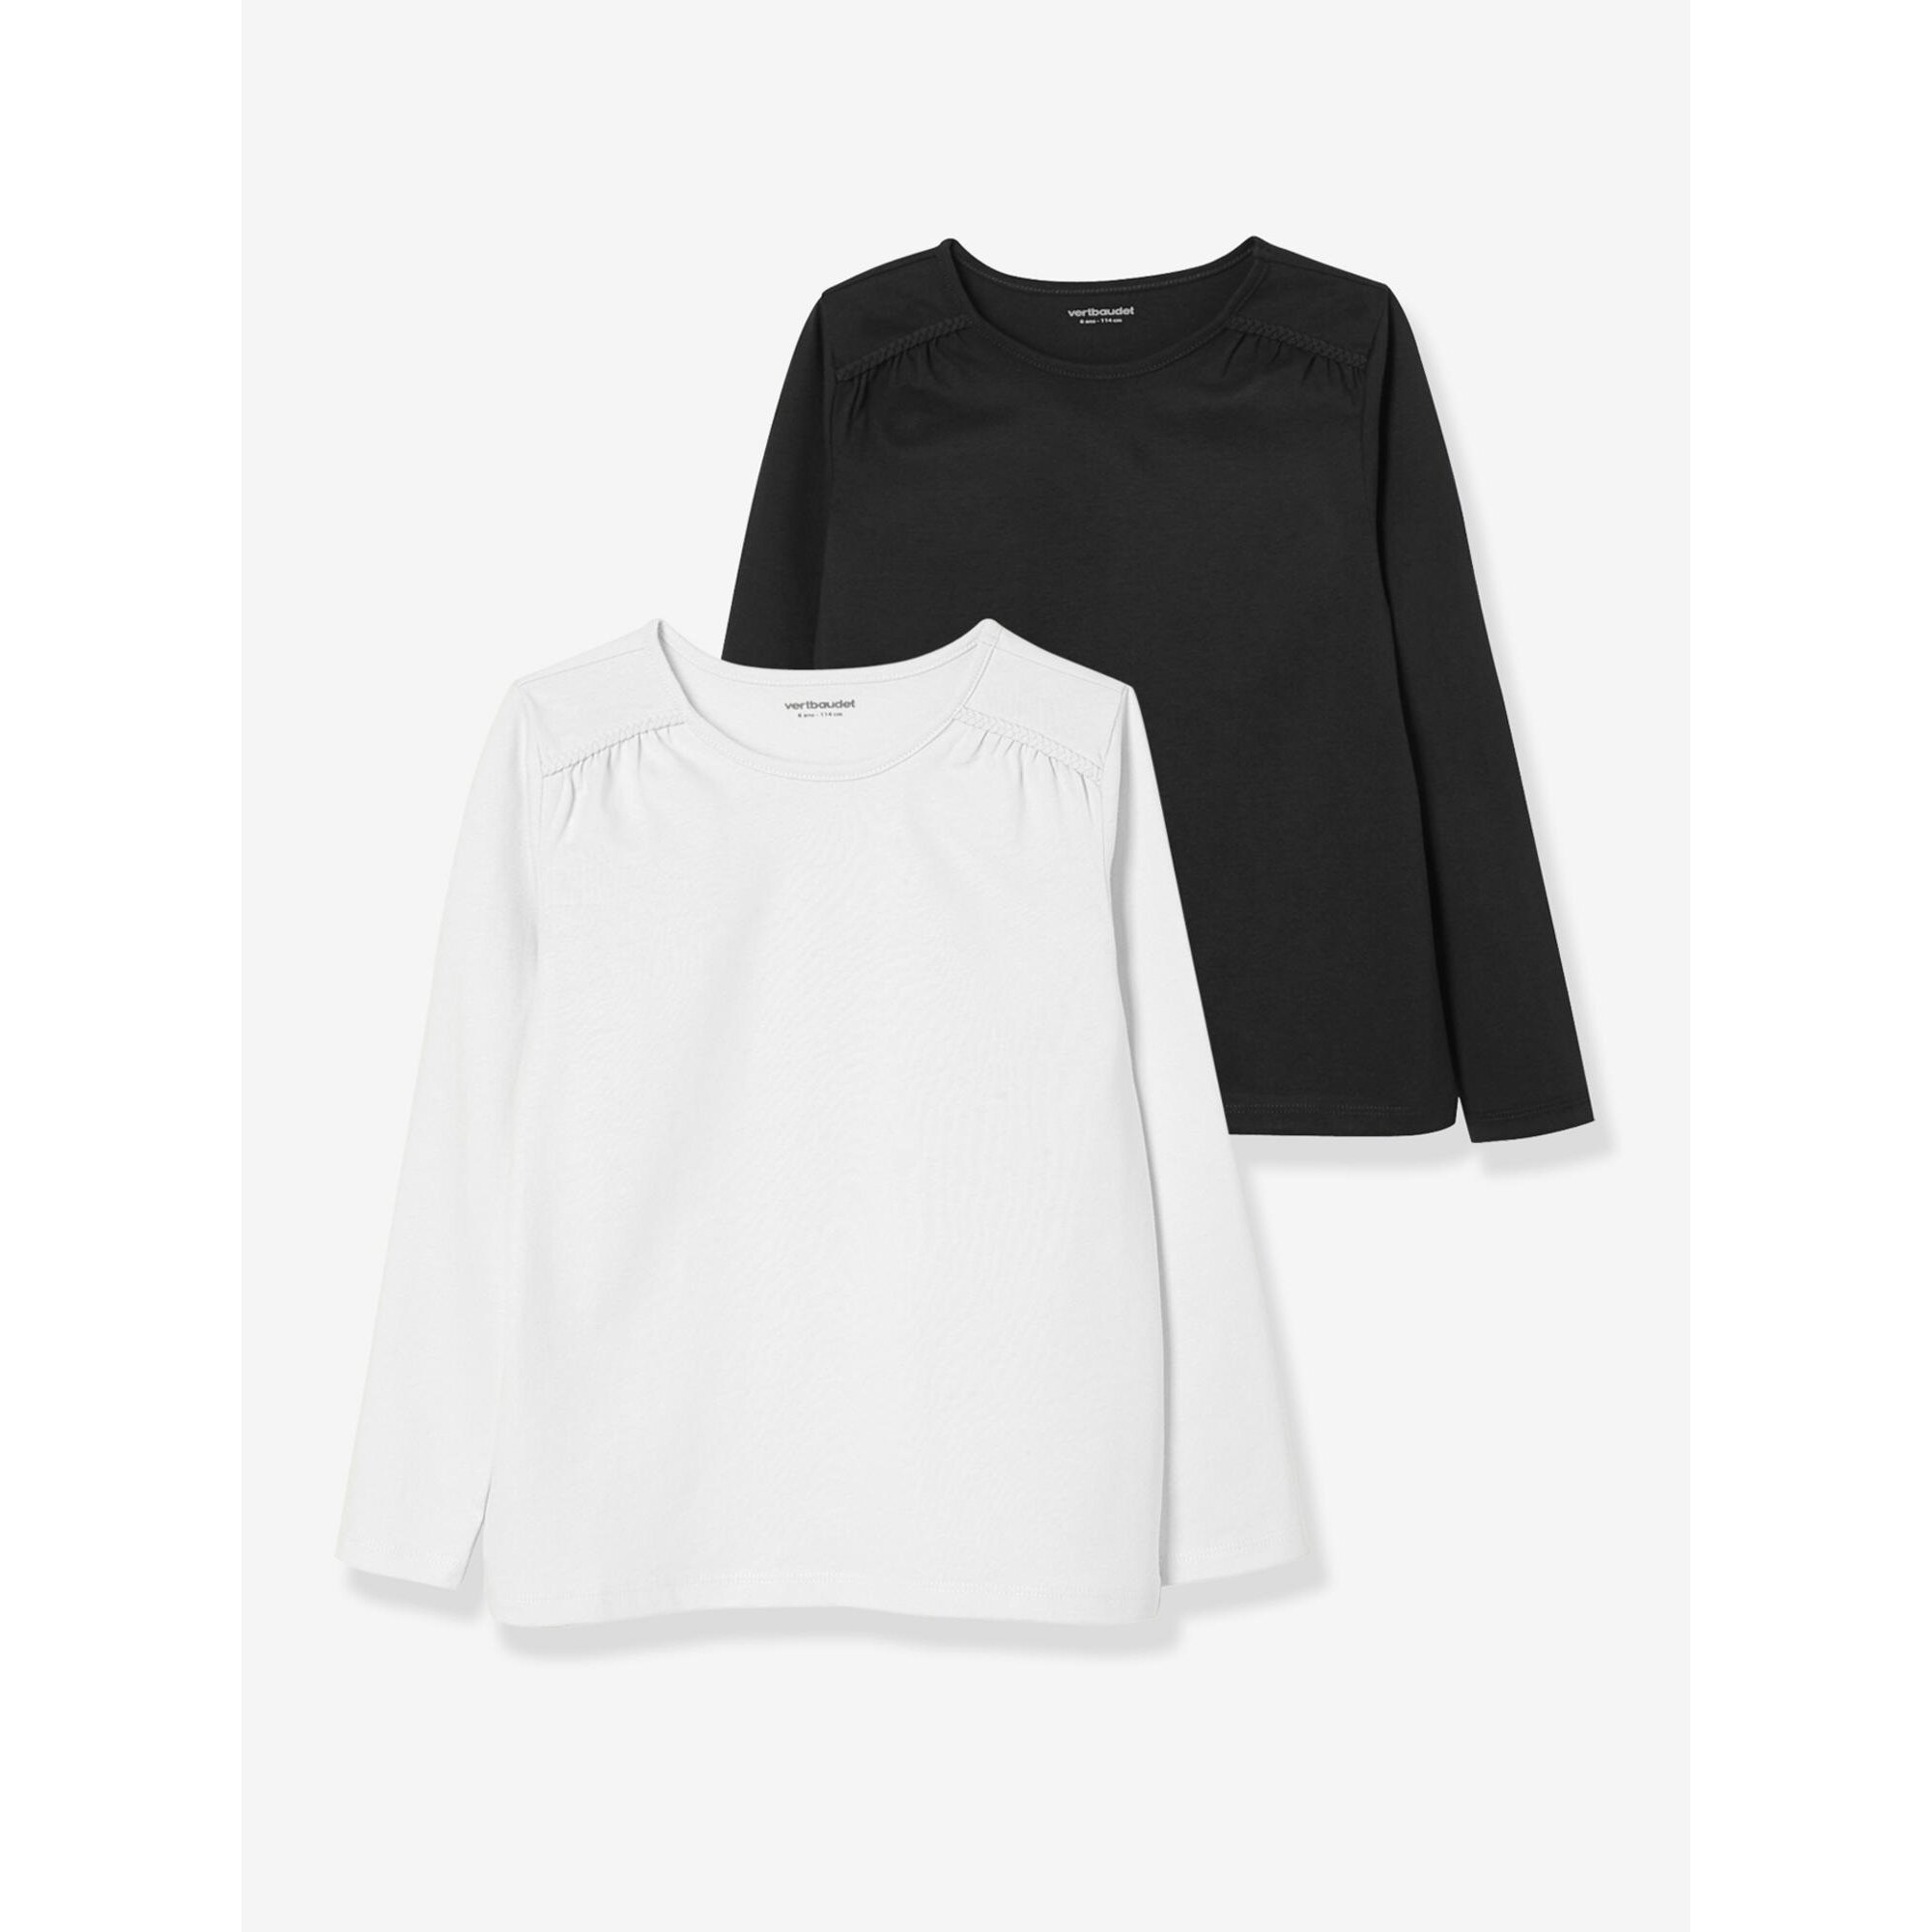 vertbaudet-2er-pack-langarm-shirts-fur-madchen-uni